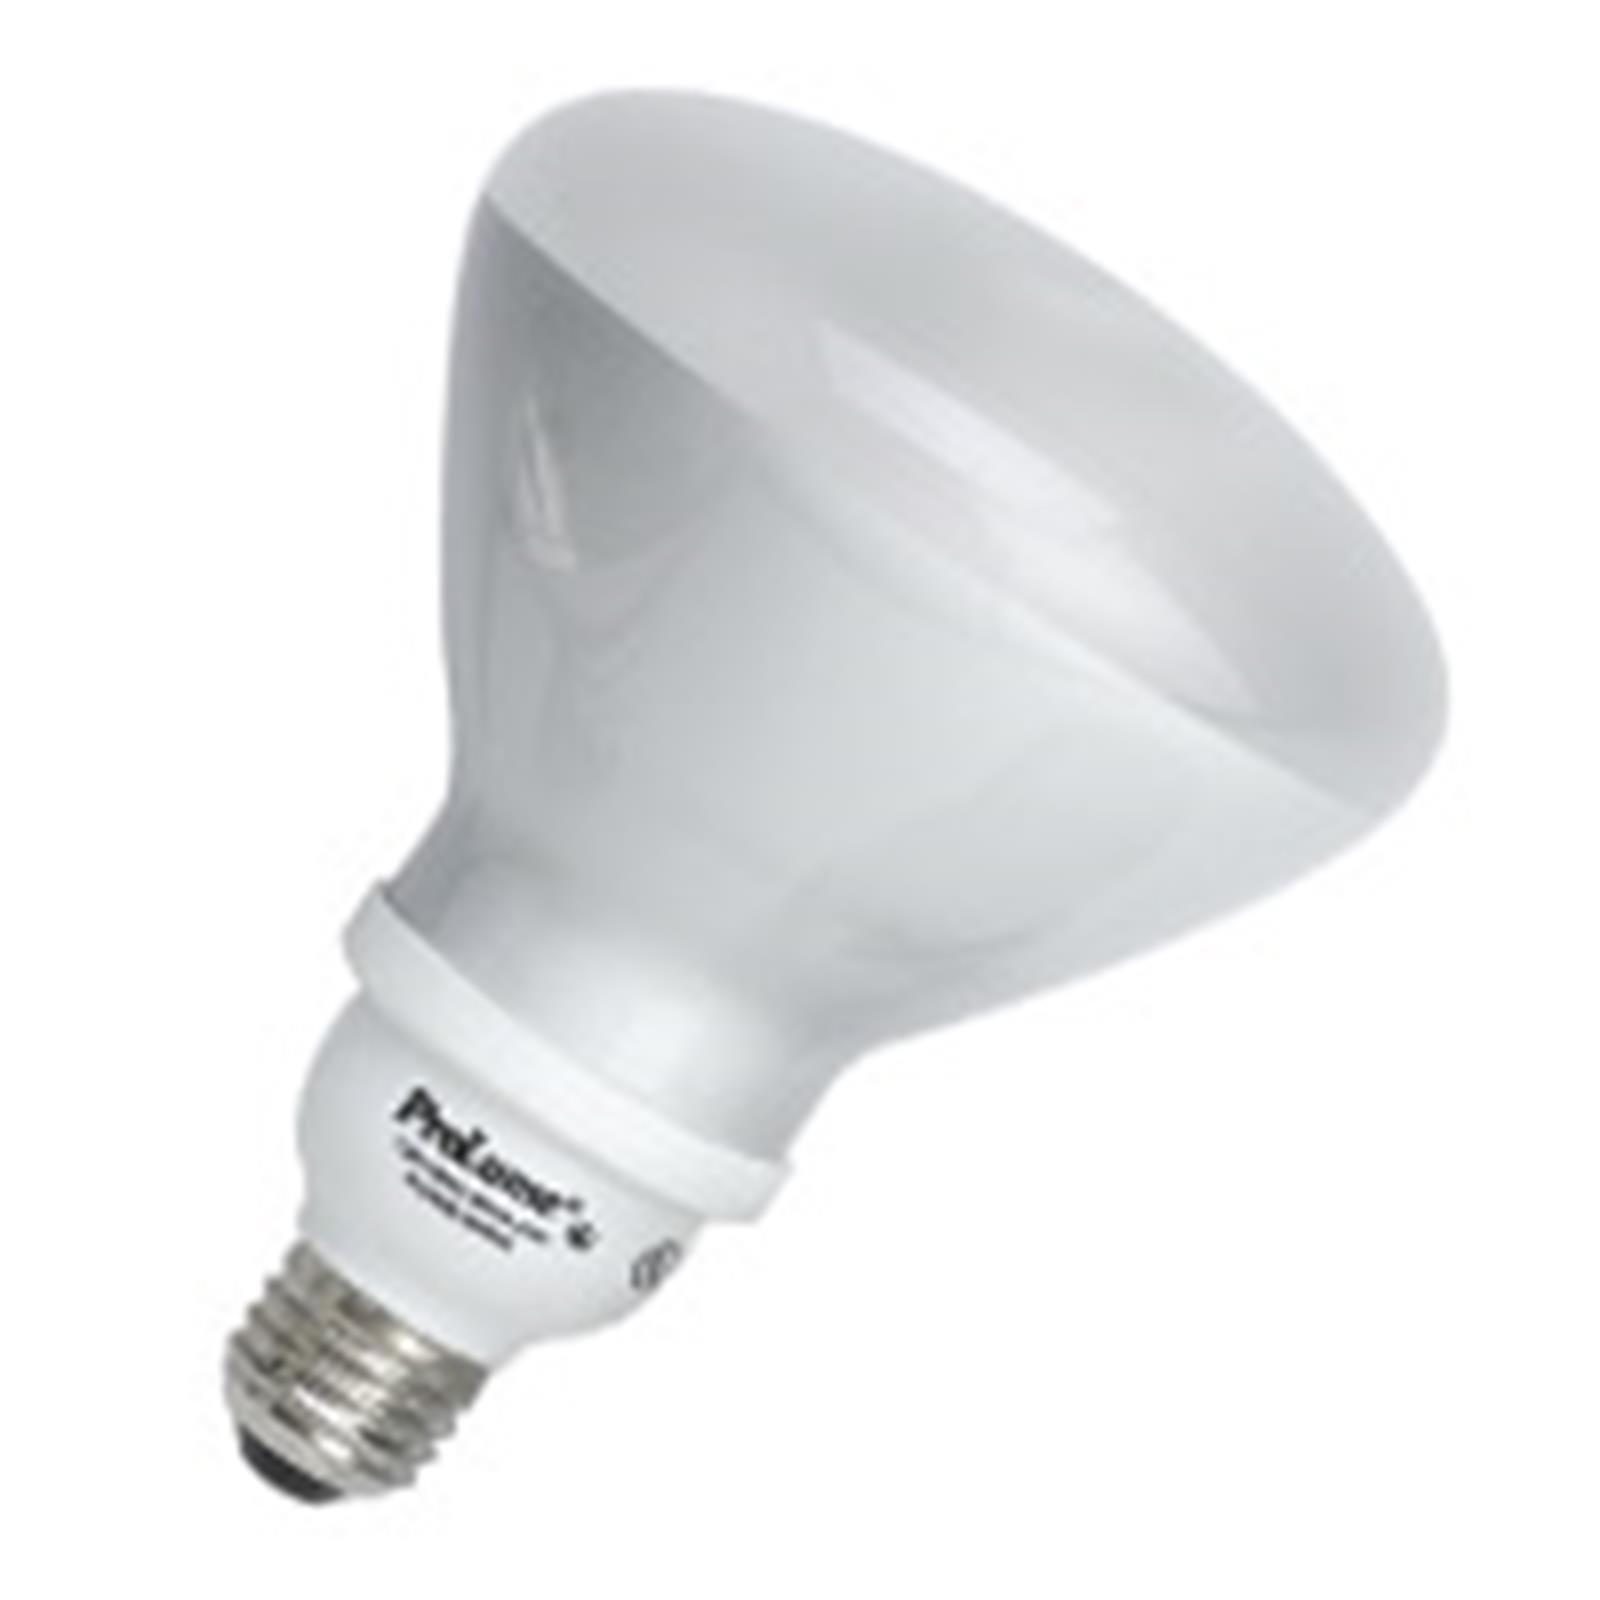 12 Qty. Halco 23W Spiral R40 3000K Med ProLume CFL23/30/R40 23w 120v CFL Soft White Flood Lamp Bulb